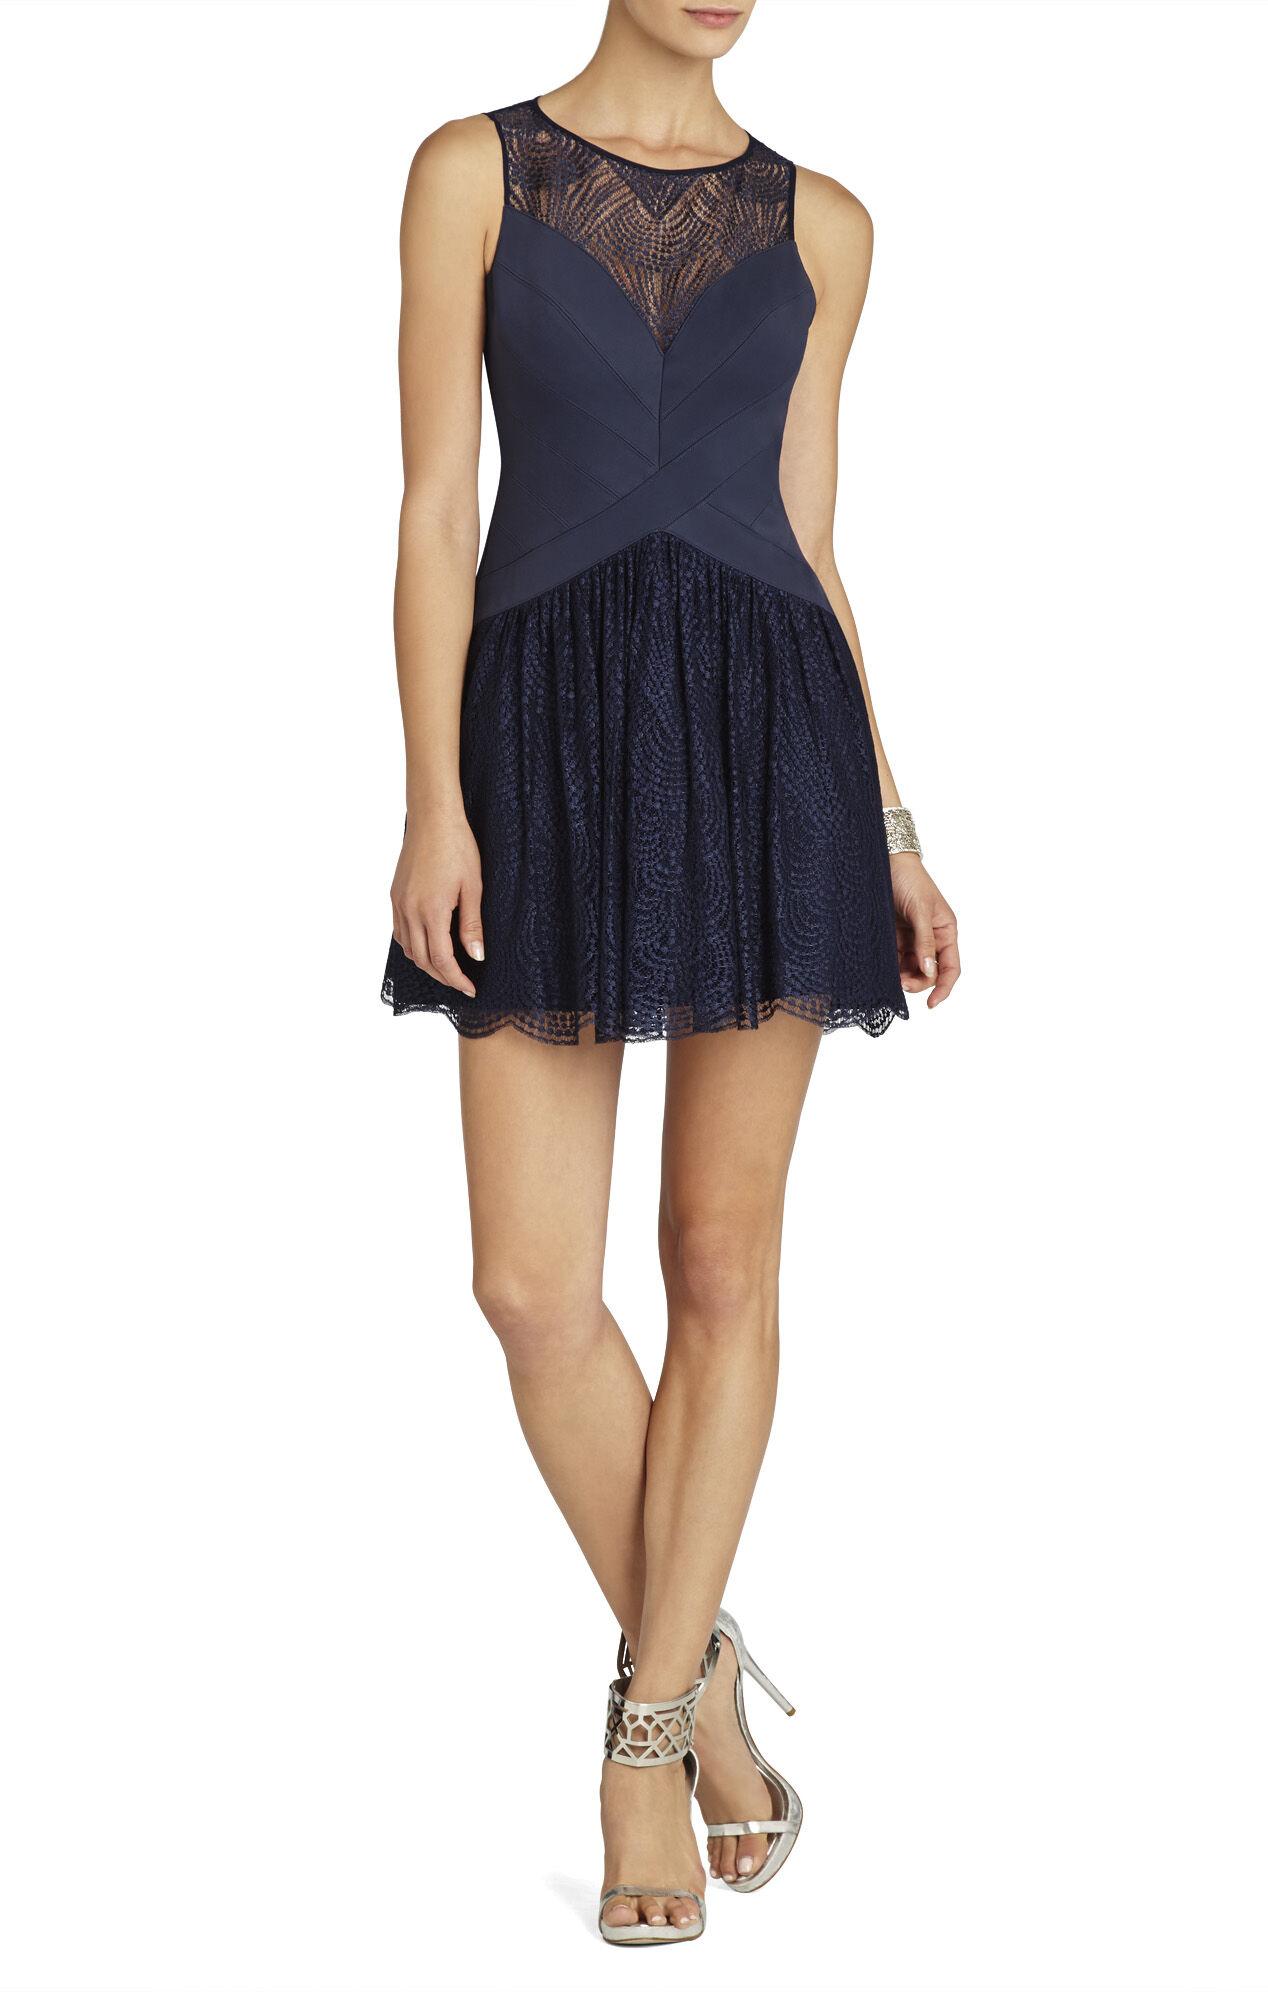 Sophiana Bandage And Lace A-Line Dress